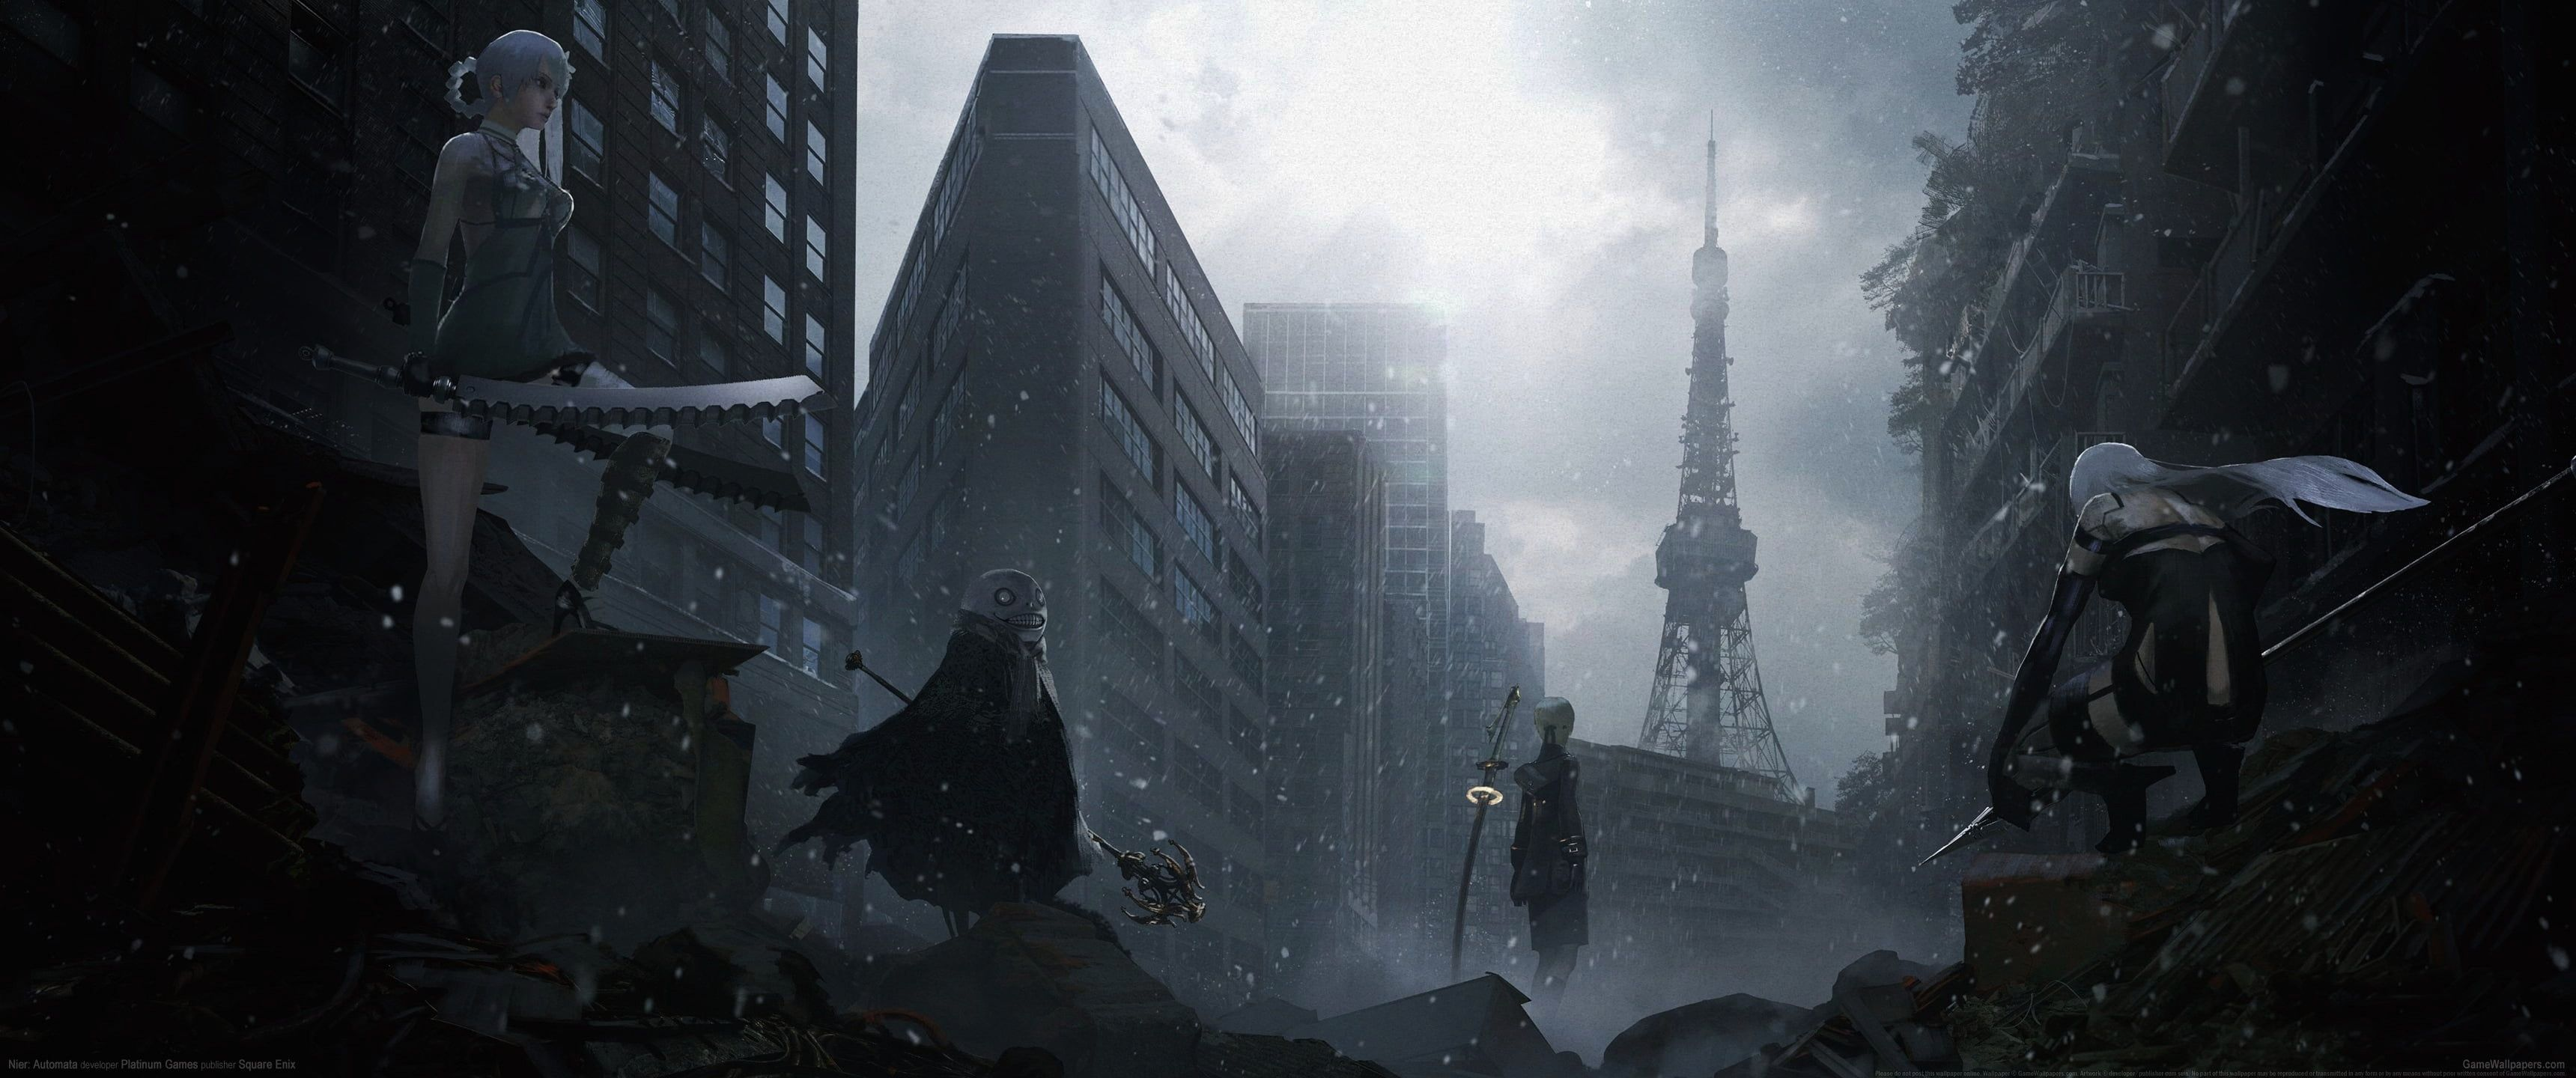 Hdwallpaper Destruction Application Metropolis Wallpaper